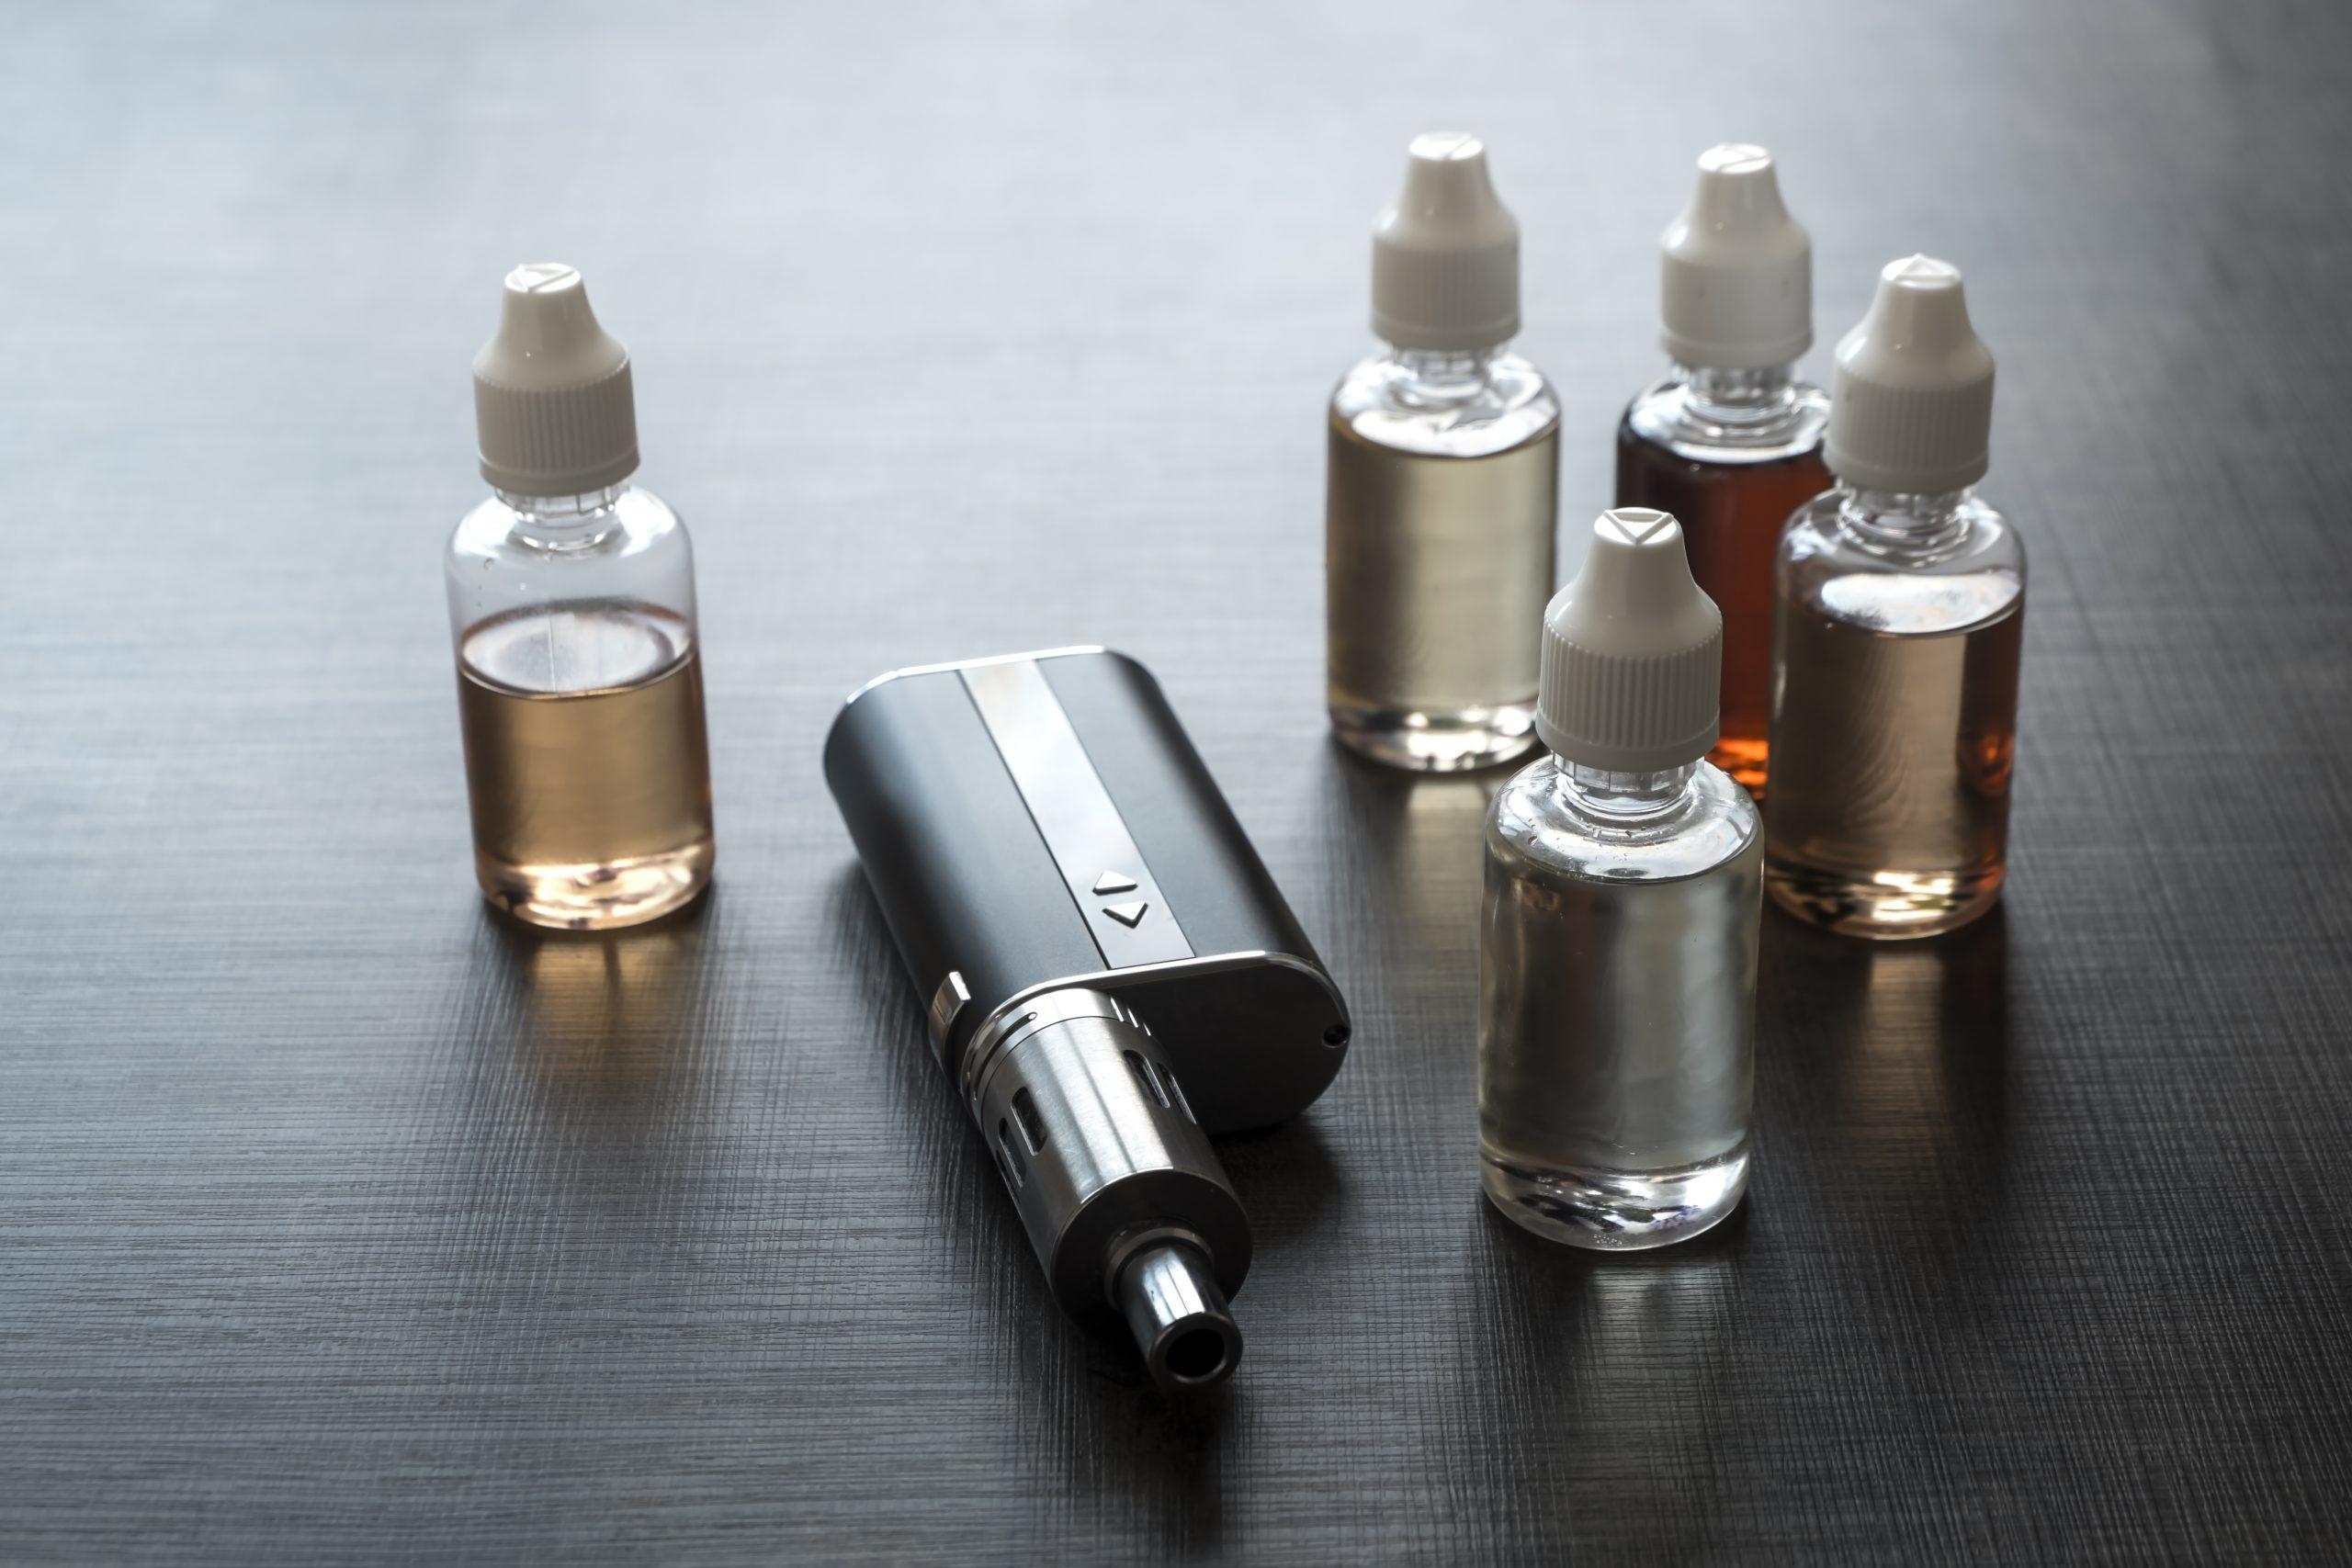 Headline: What Makes a Good E-Liquid Provider?